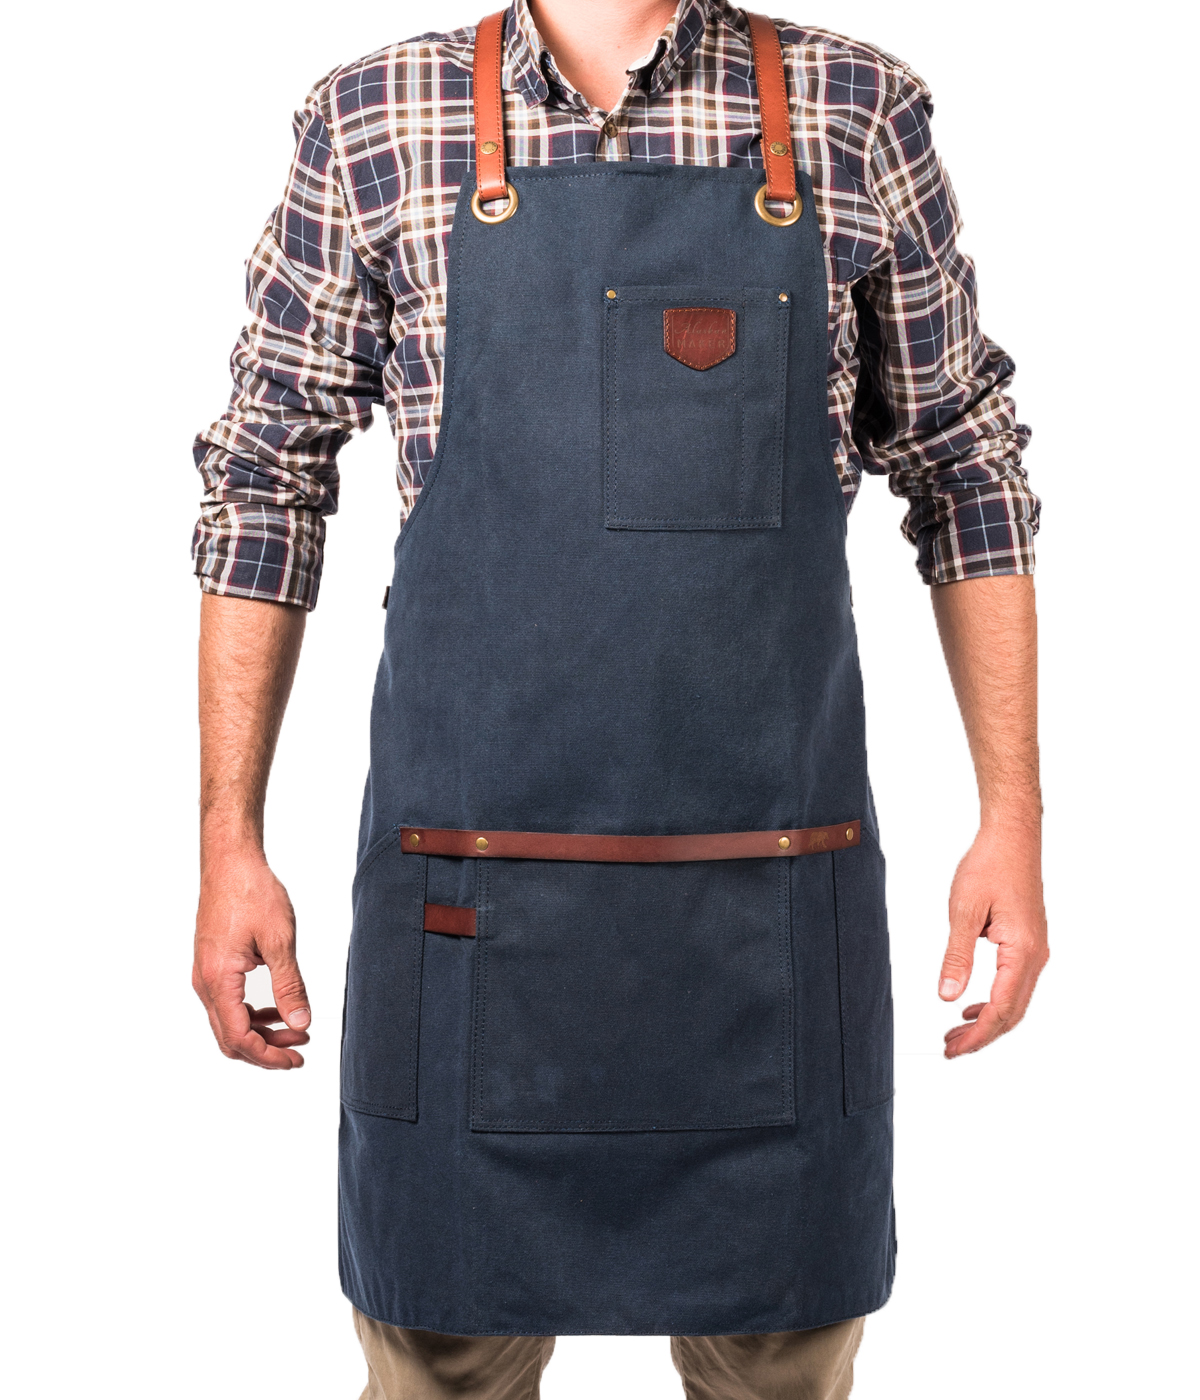 Tablier de cuisine homme alaskan maker N°547